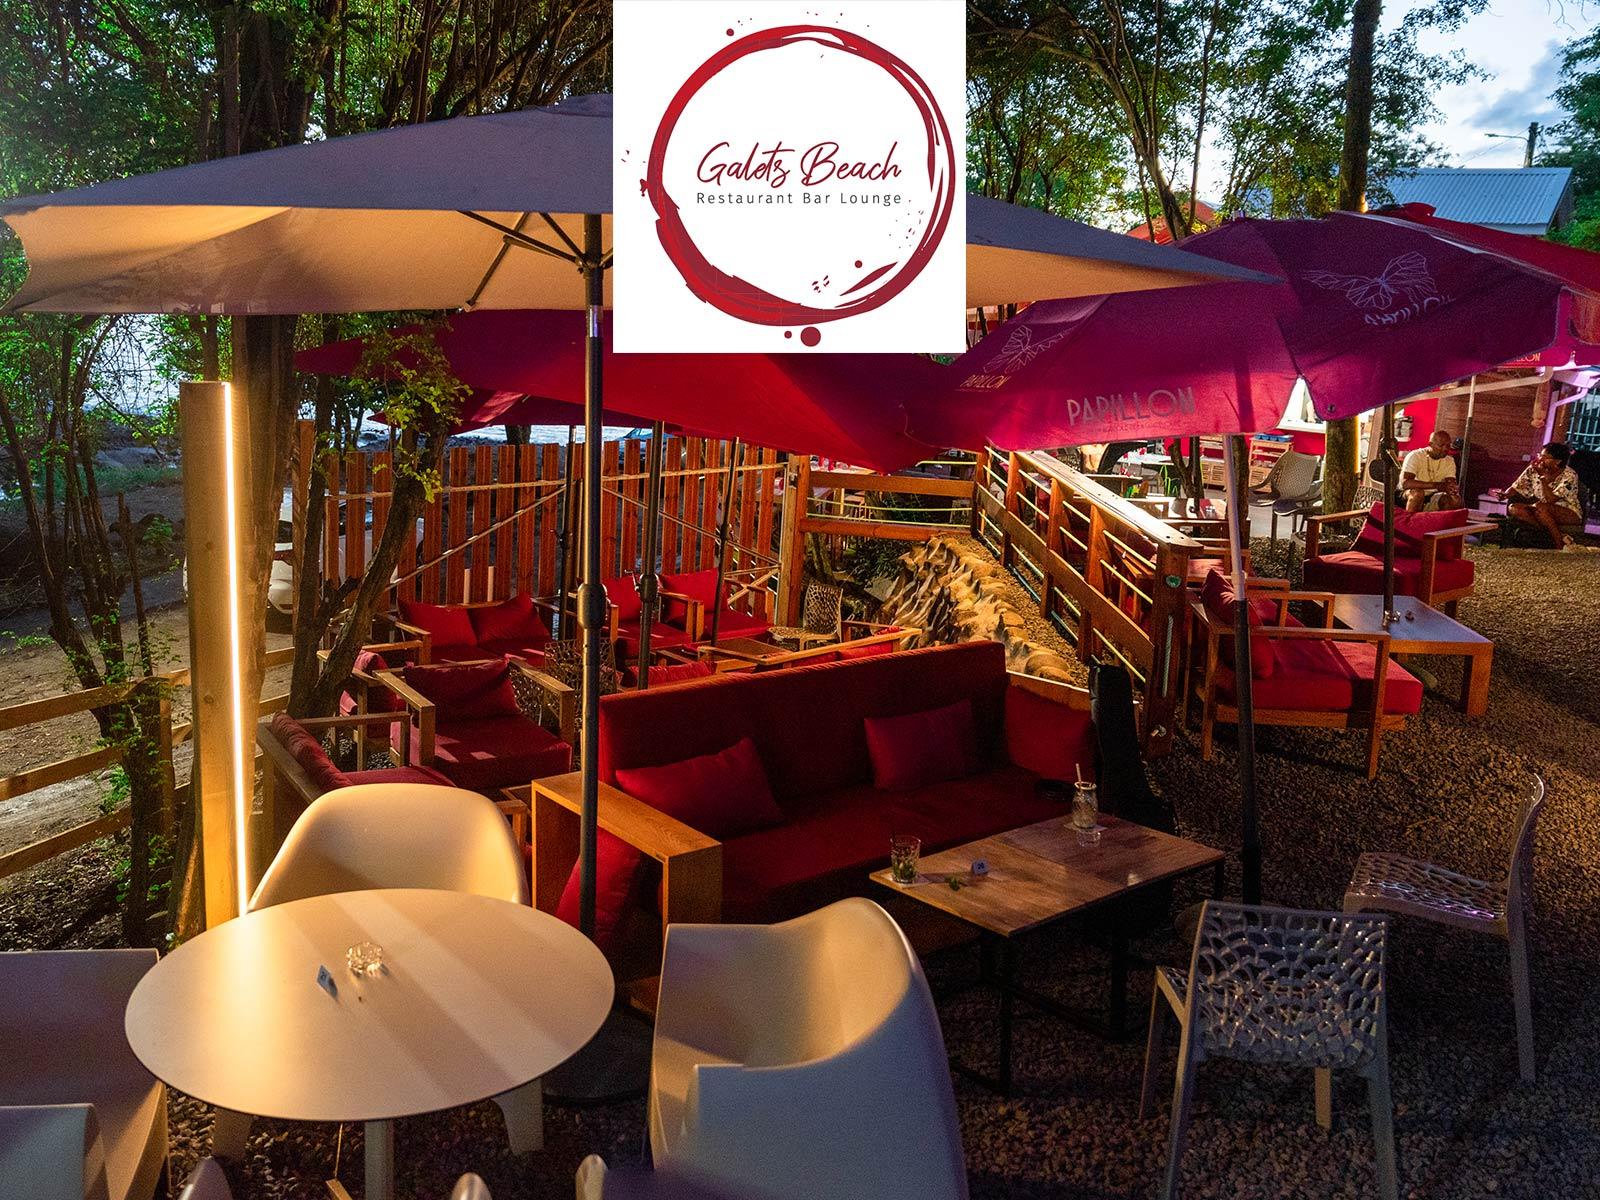 Galets Beach - Restaurant Bar Lounge